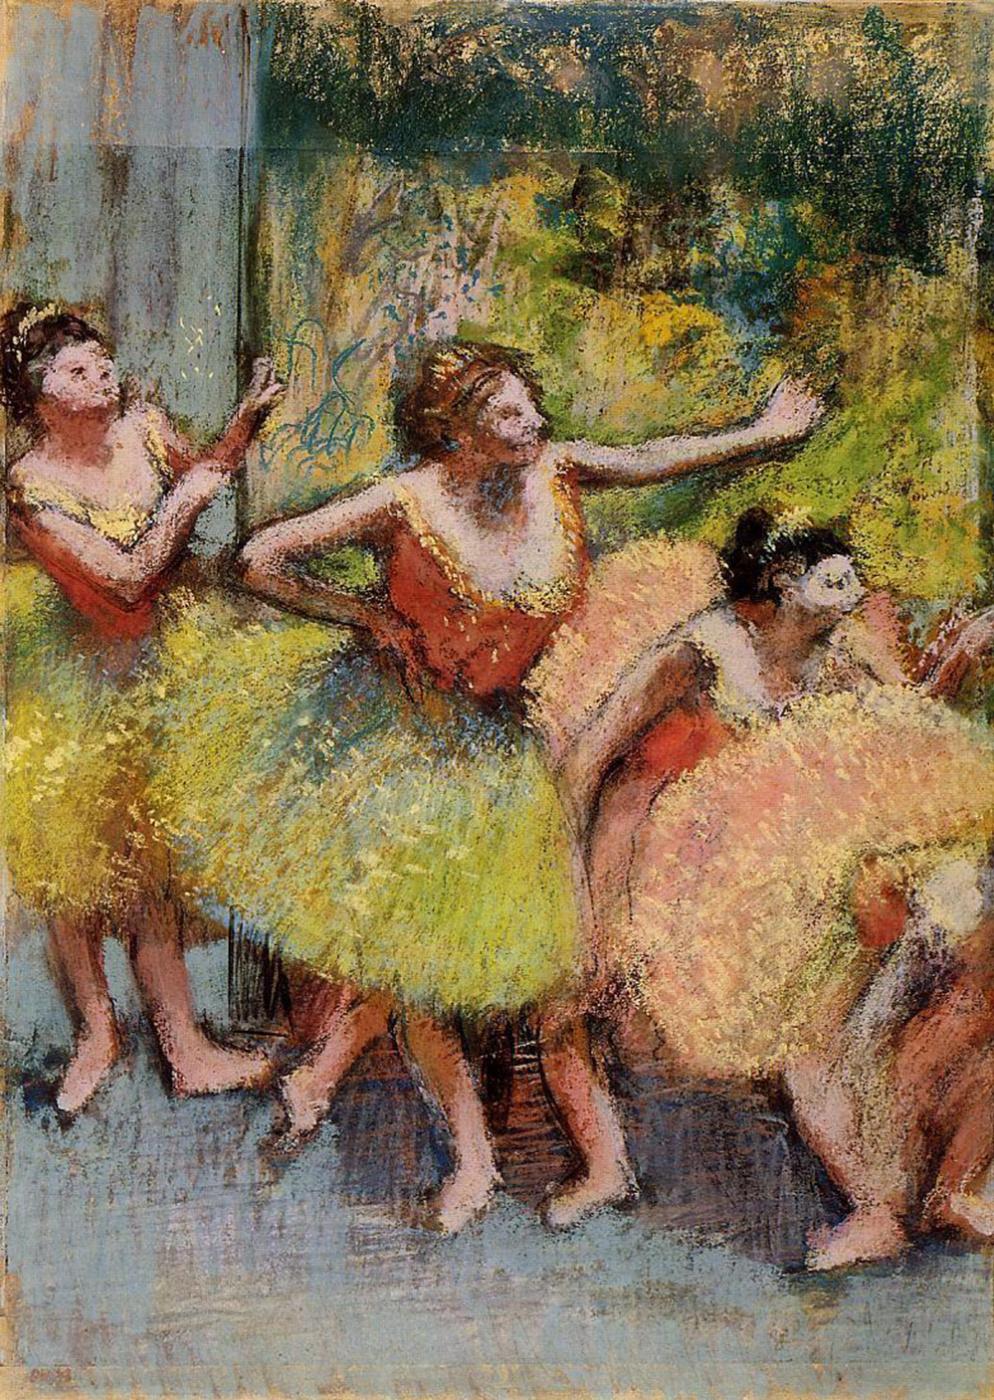 Edgar Degas. Dancers in green and yellow